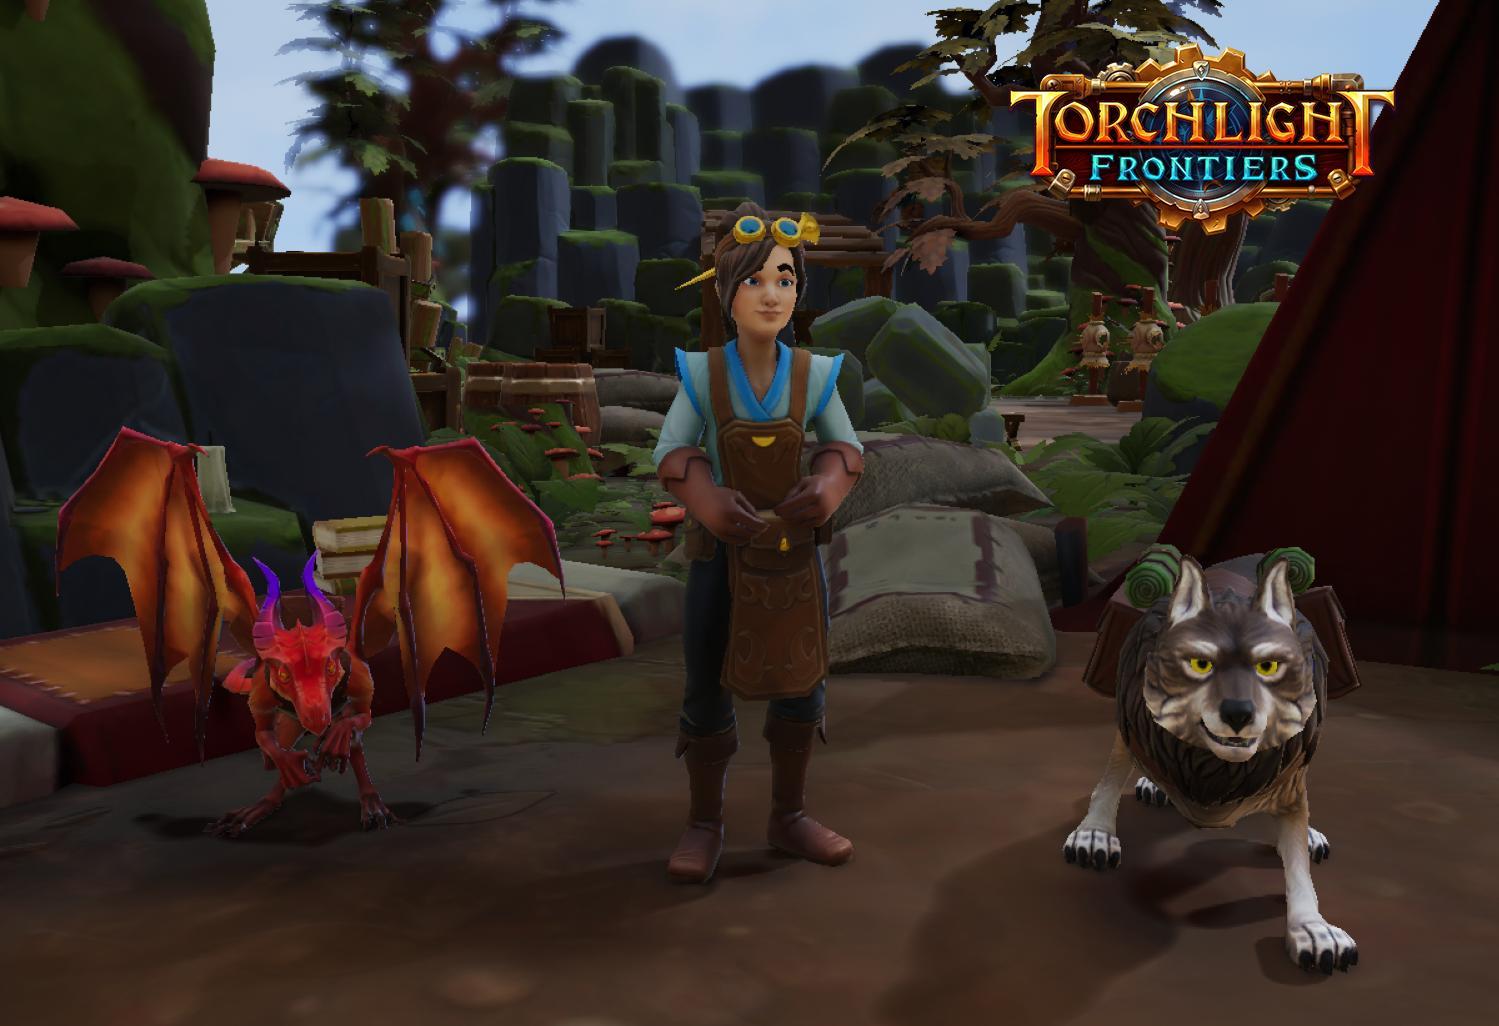 Torchlight Frontiers Beast Buddies pets Dragon Wolf